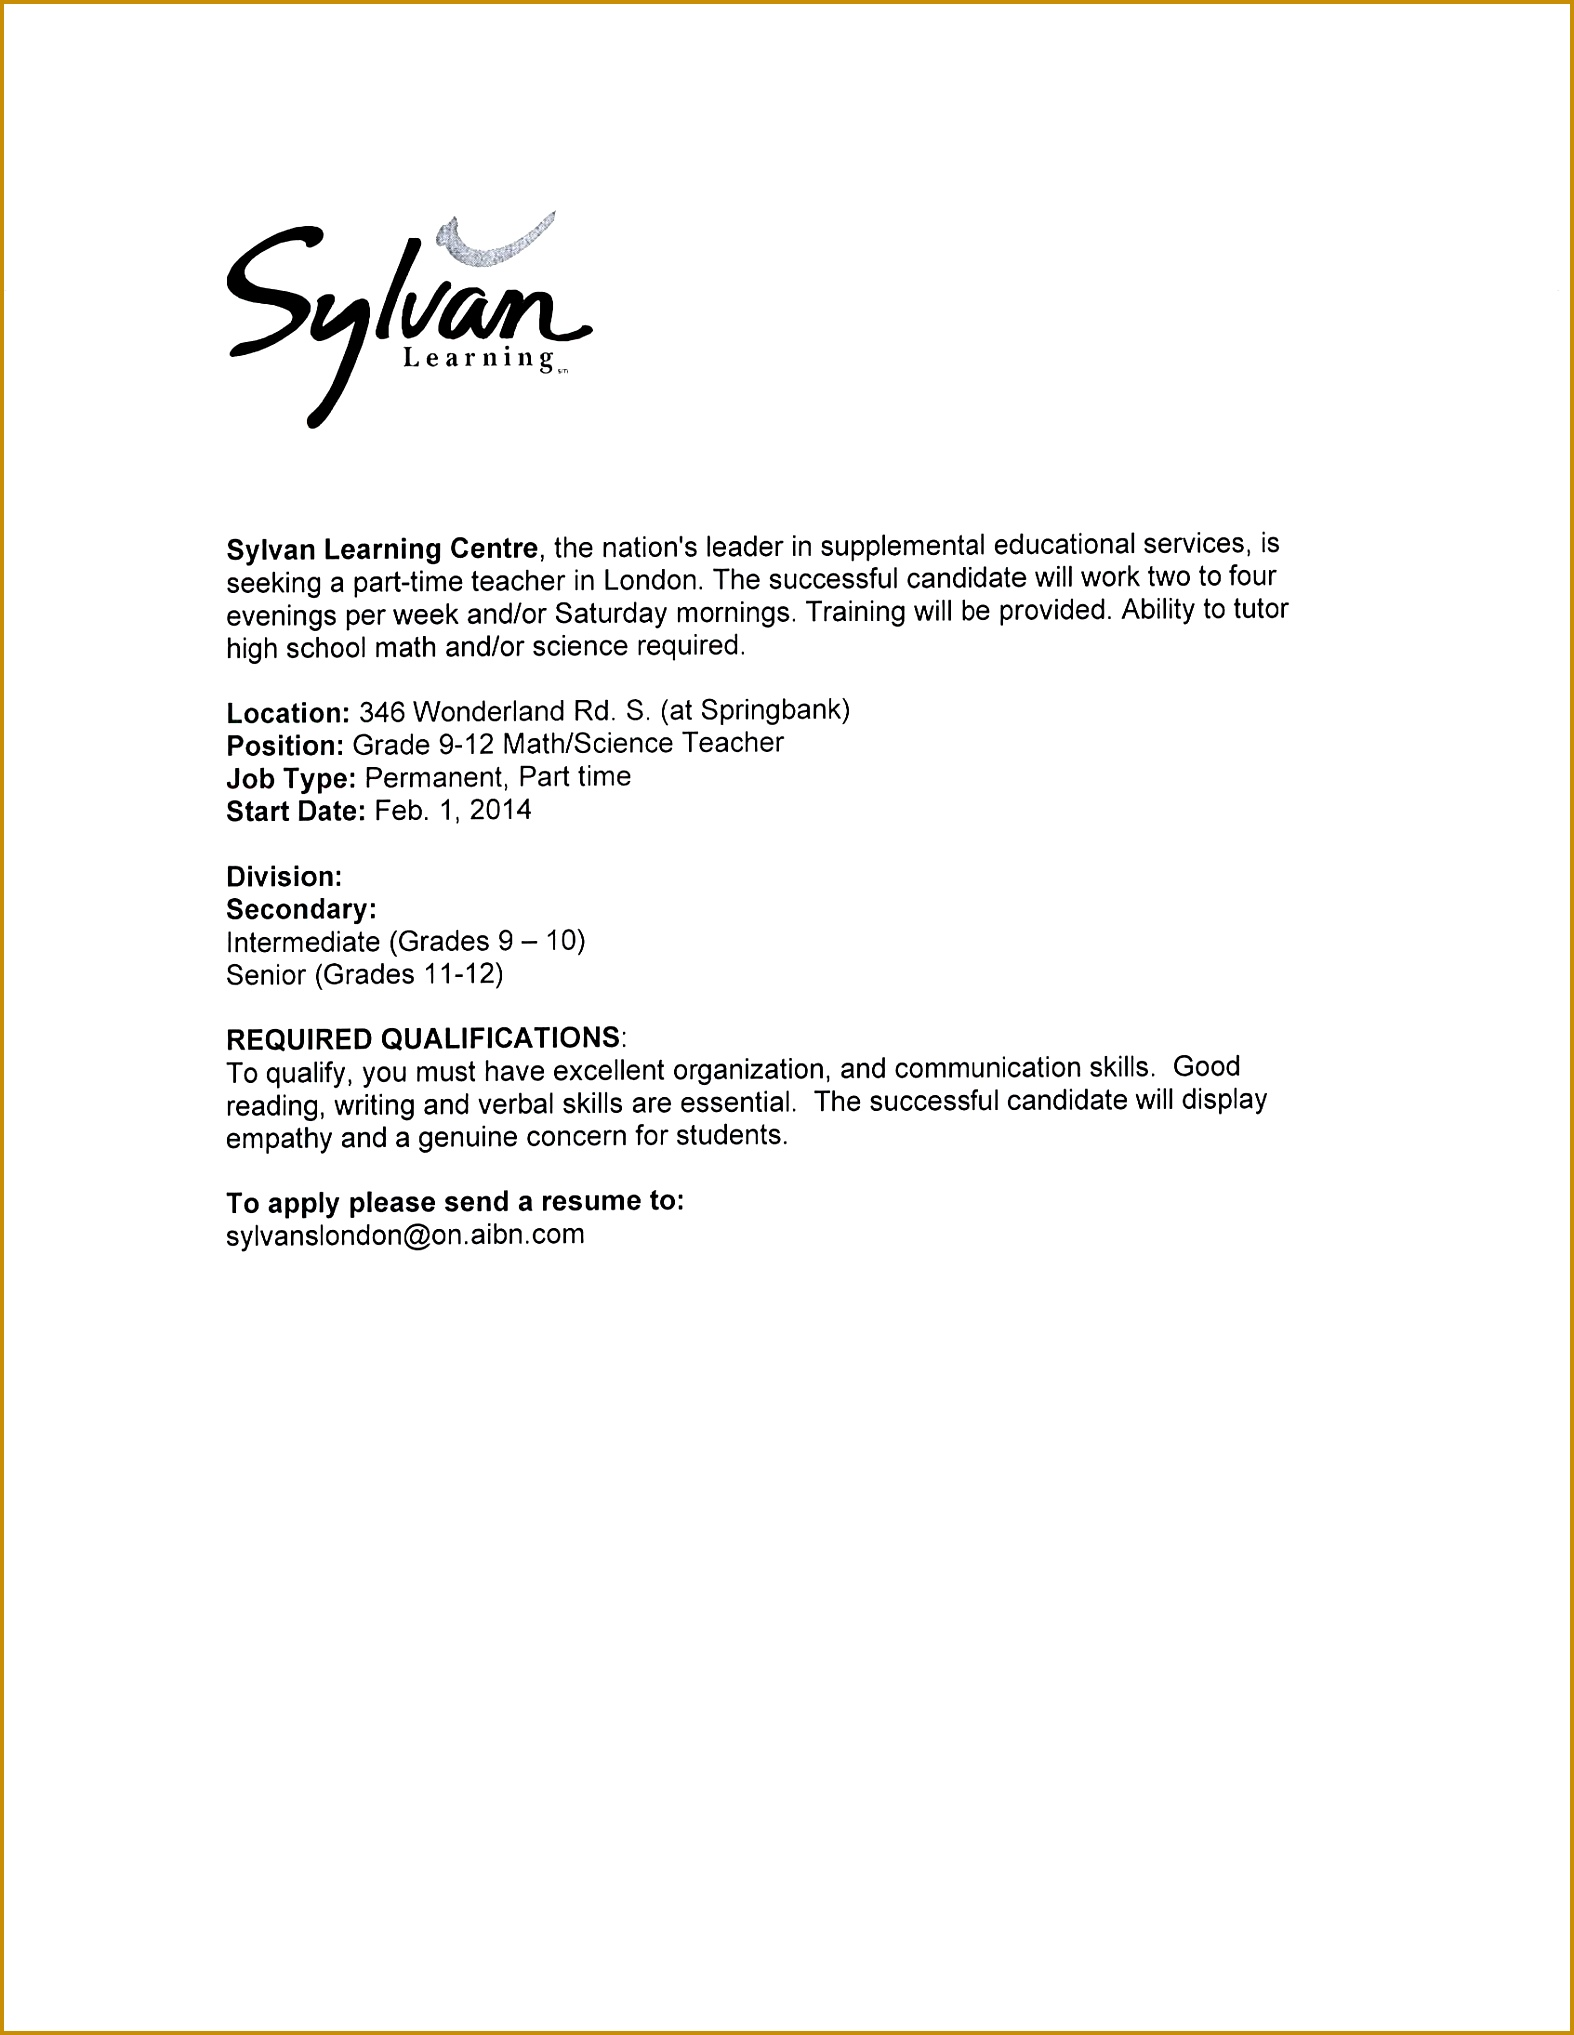 ... Volunteer Confirmation Letter Sample 85486 Blackberry Developer Cover  Letter Writing A Cover Letter For A ...